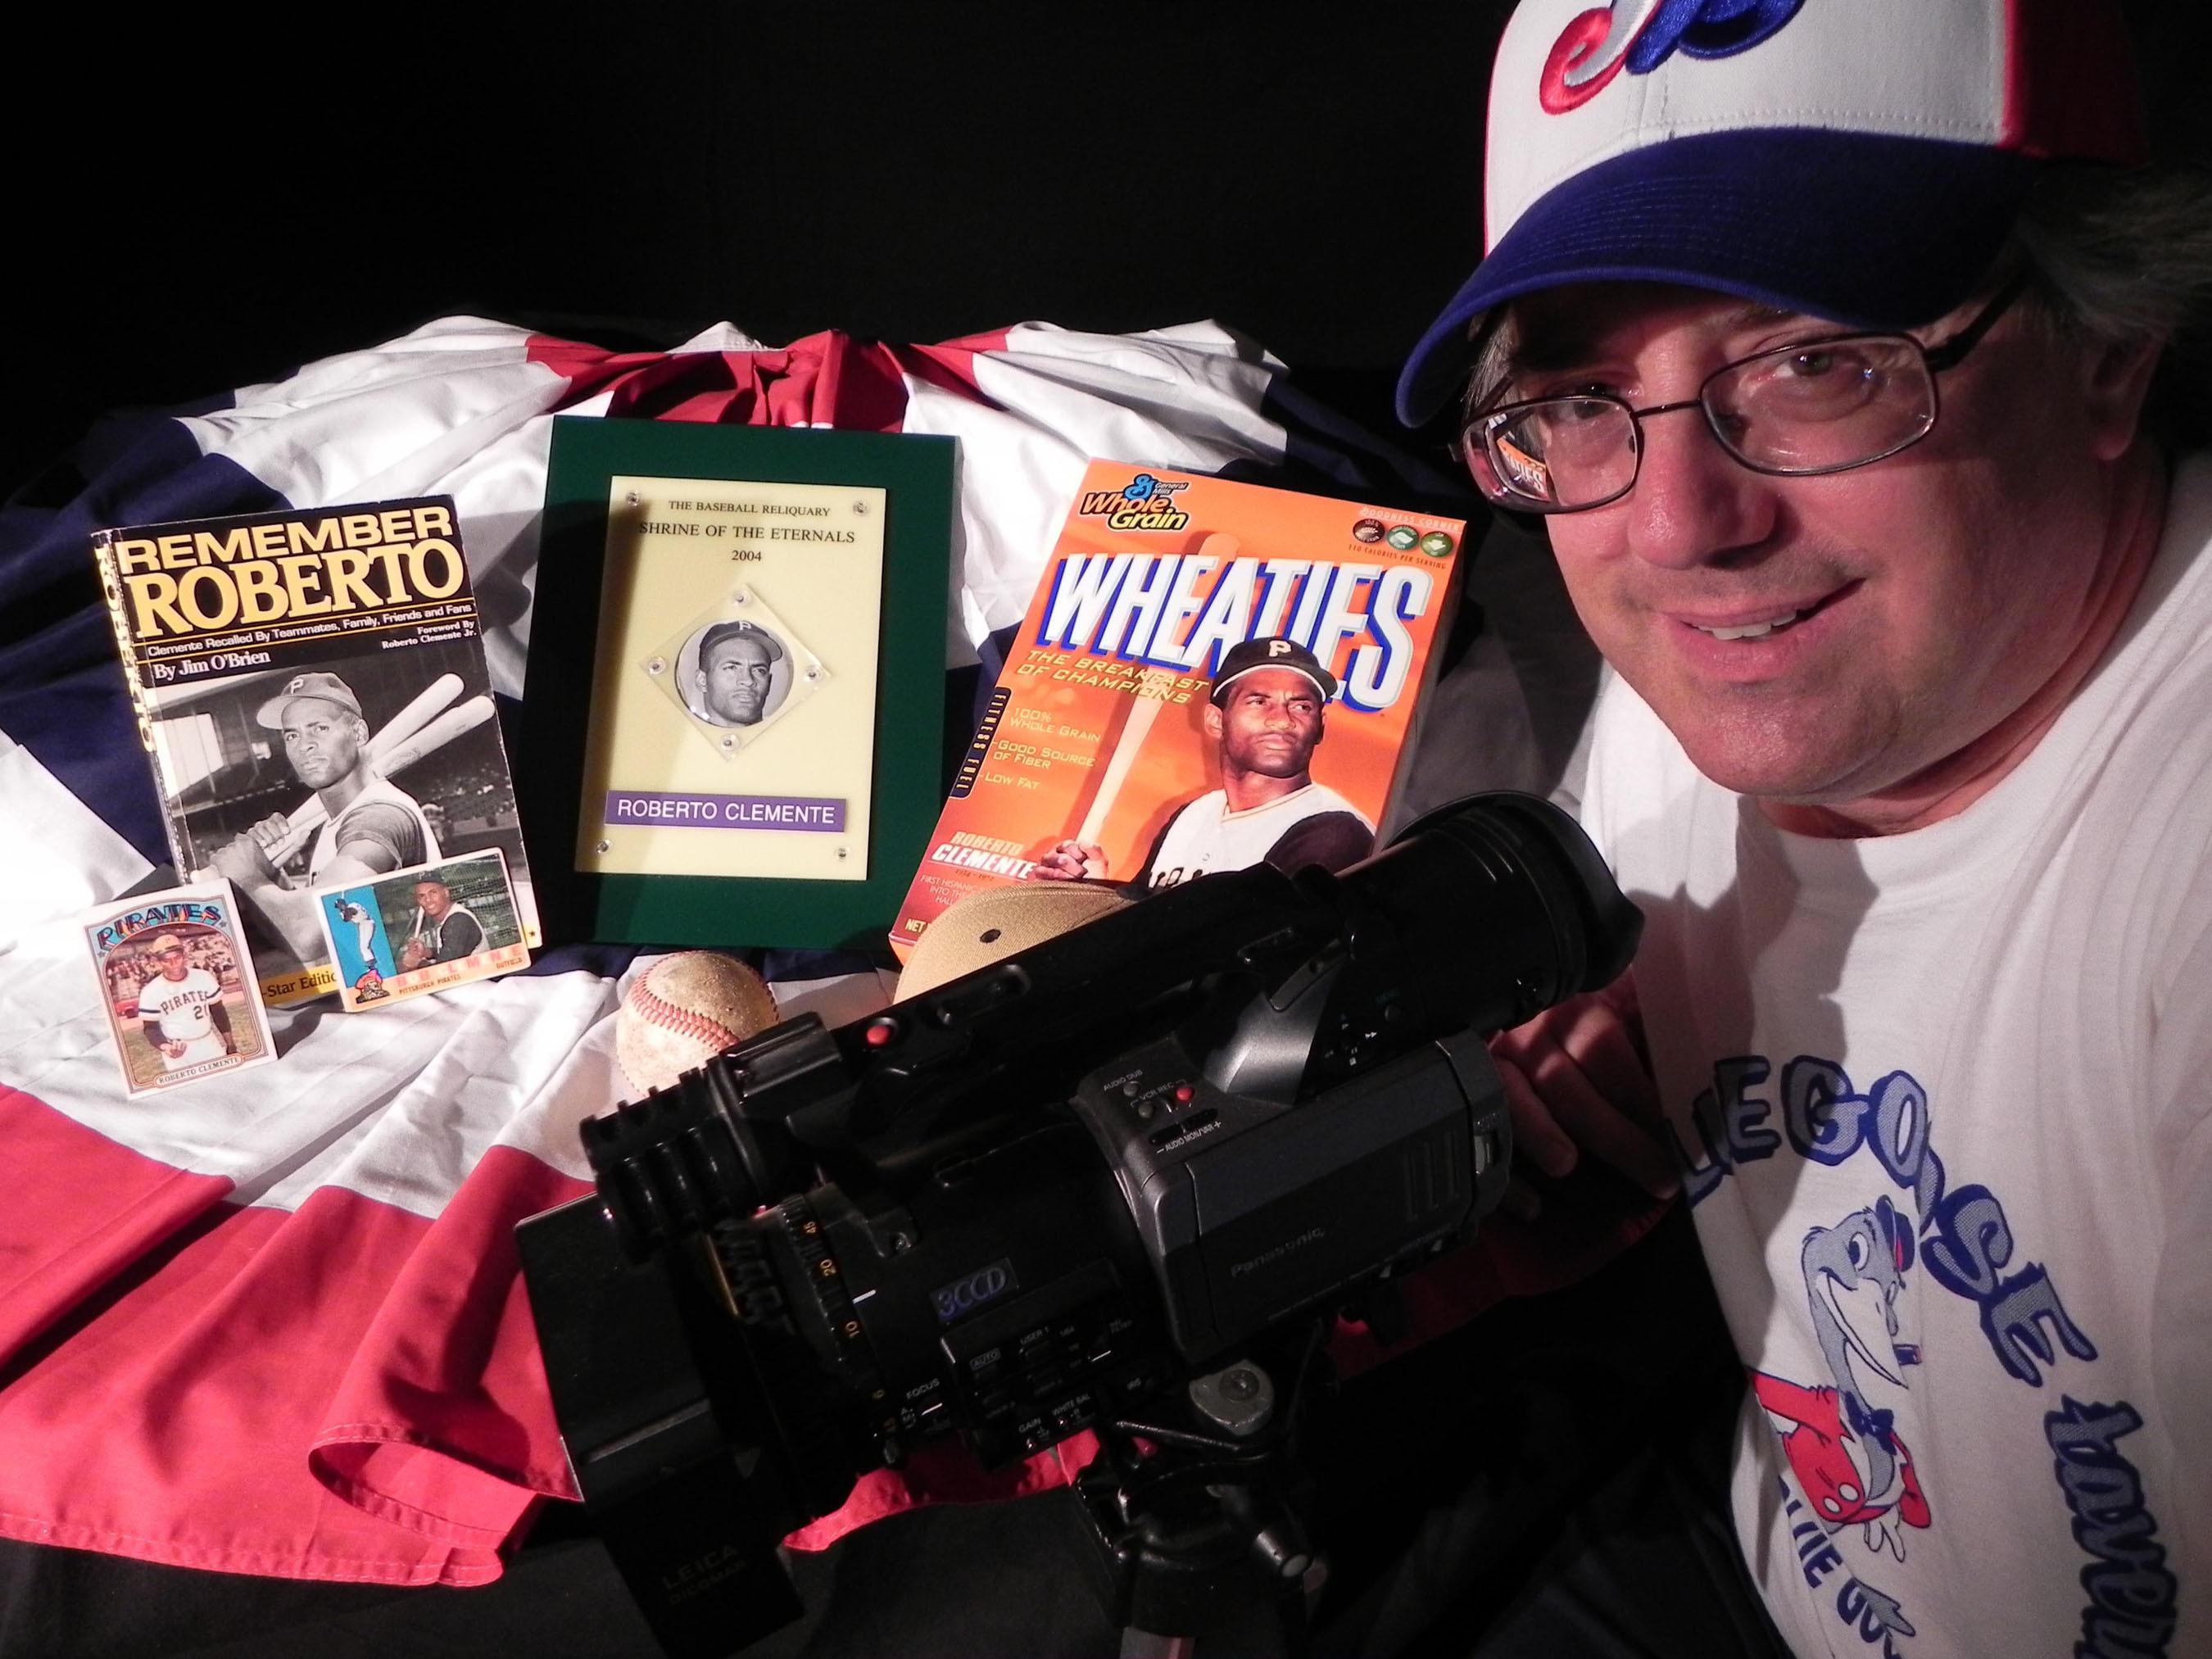 Producer/director Jon Leonoudakis prepares for an insert shot featuring Pittsburgh Pirates great Roberto Clemente. (PRNewsFoto/Jon Leonoudakis) (PRNewsFoto/JON LEONOUDAKIS)